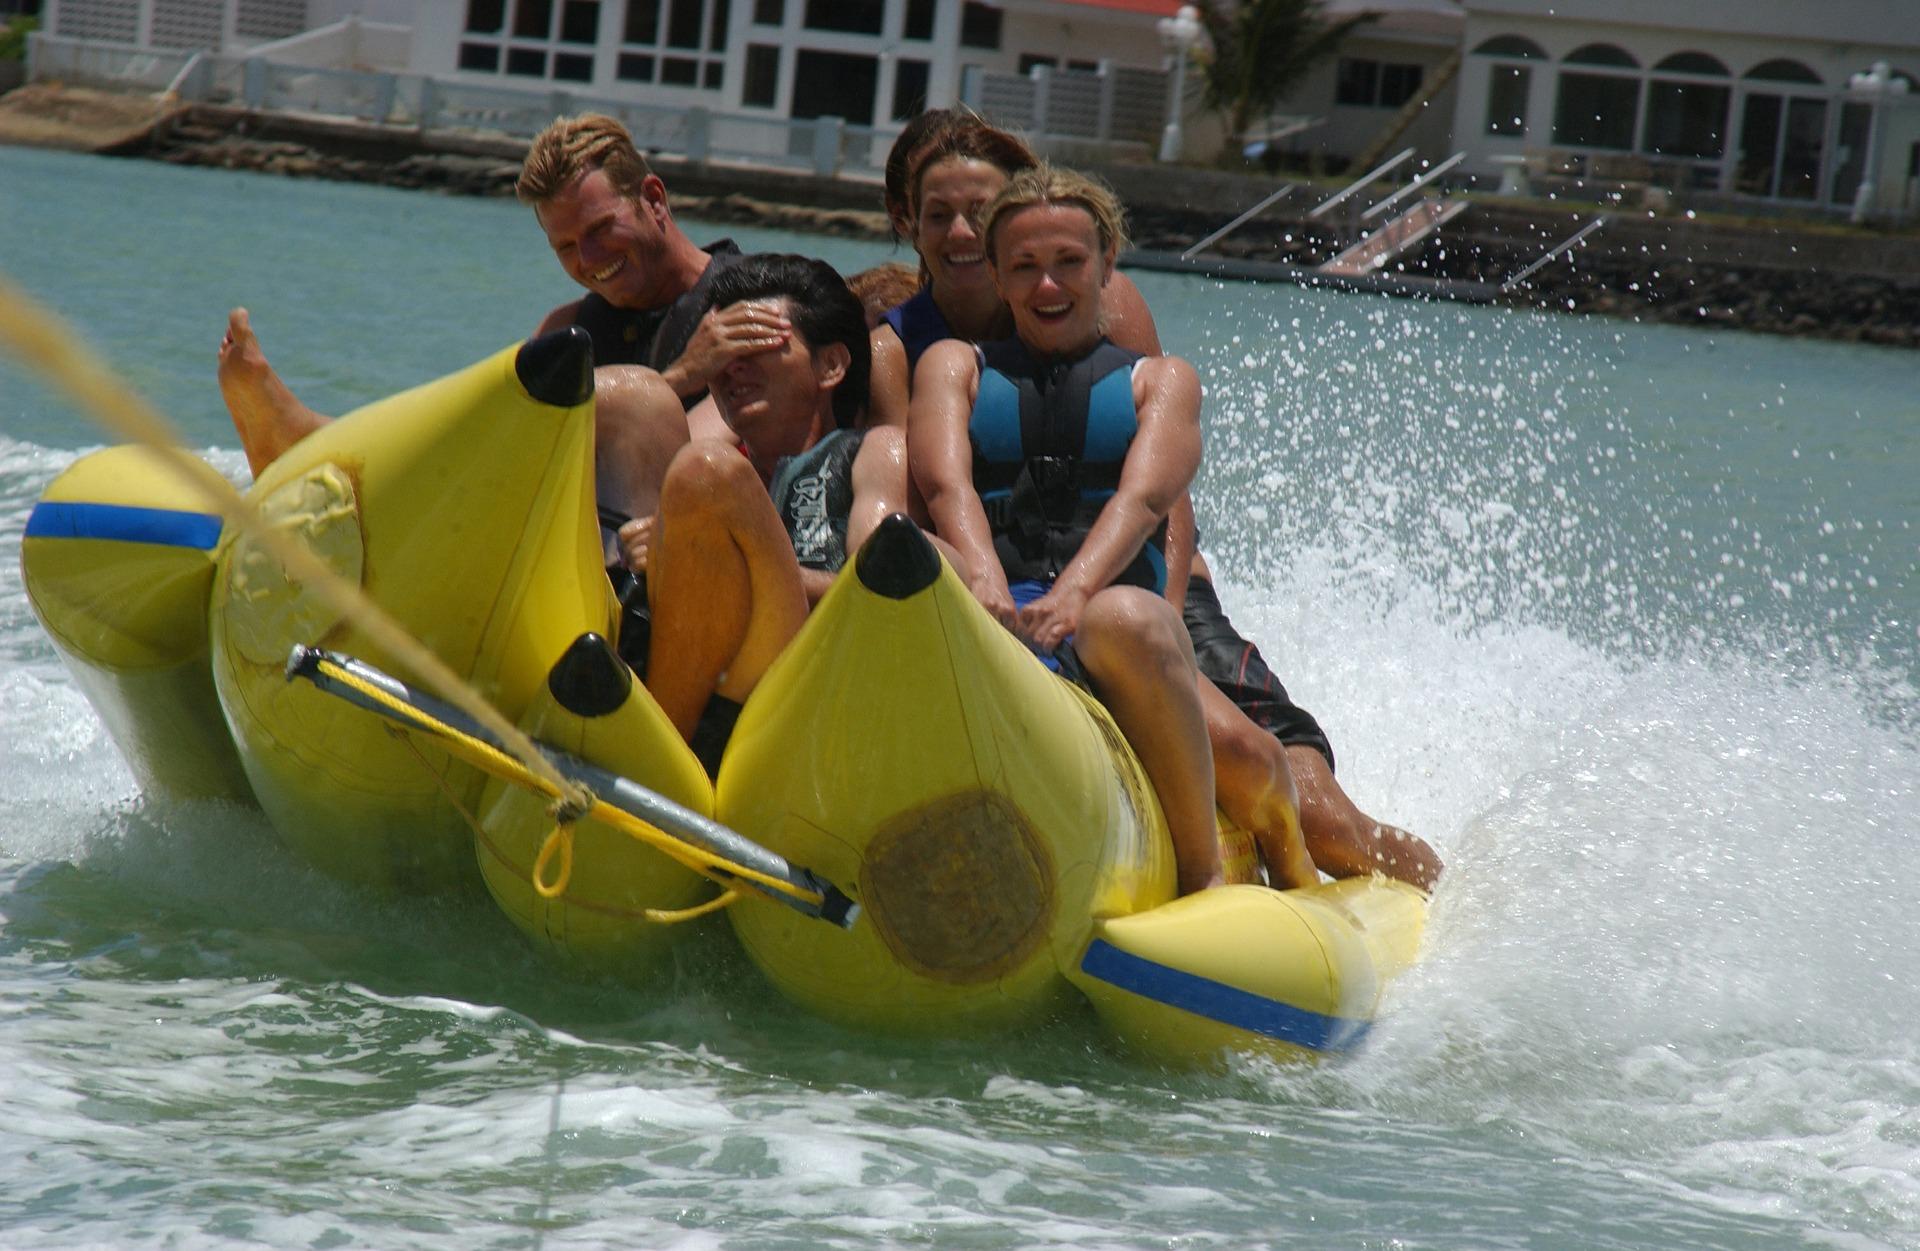 banana-boat-ride-595350_1920.jpg